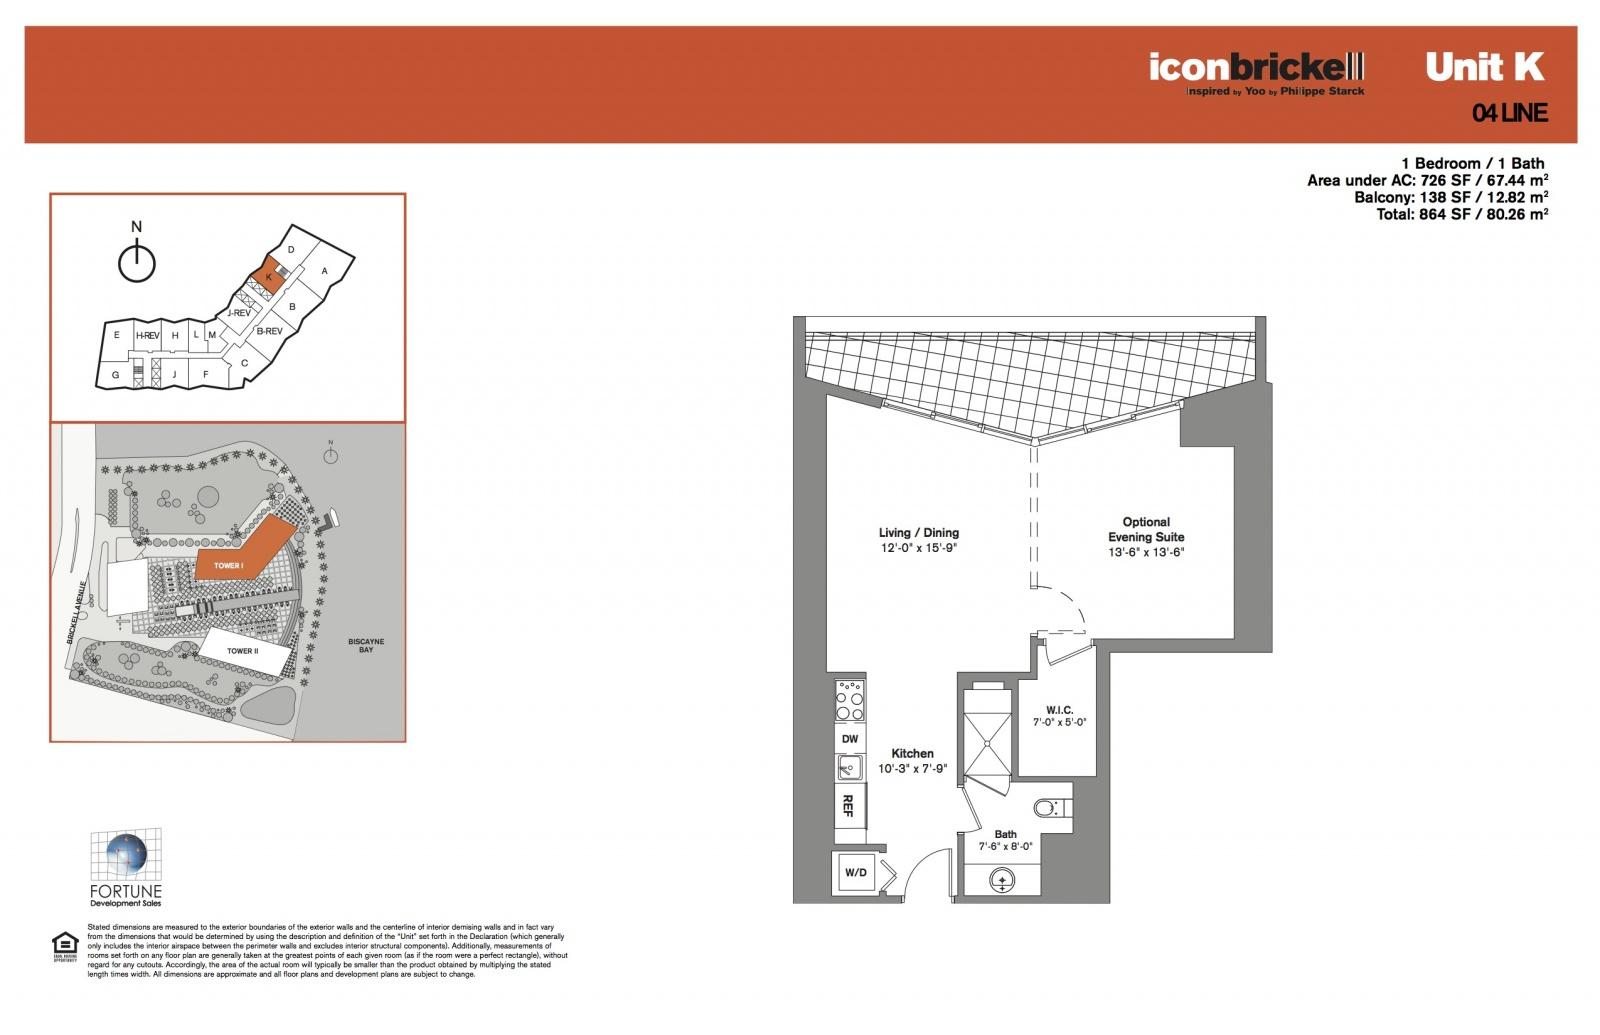 Icon Brickell One, line 04 floor plan